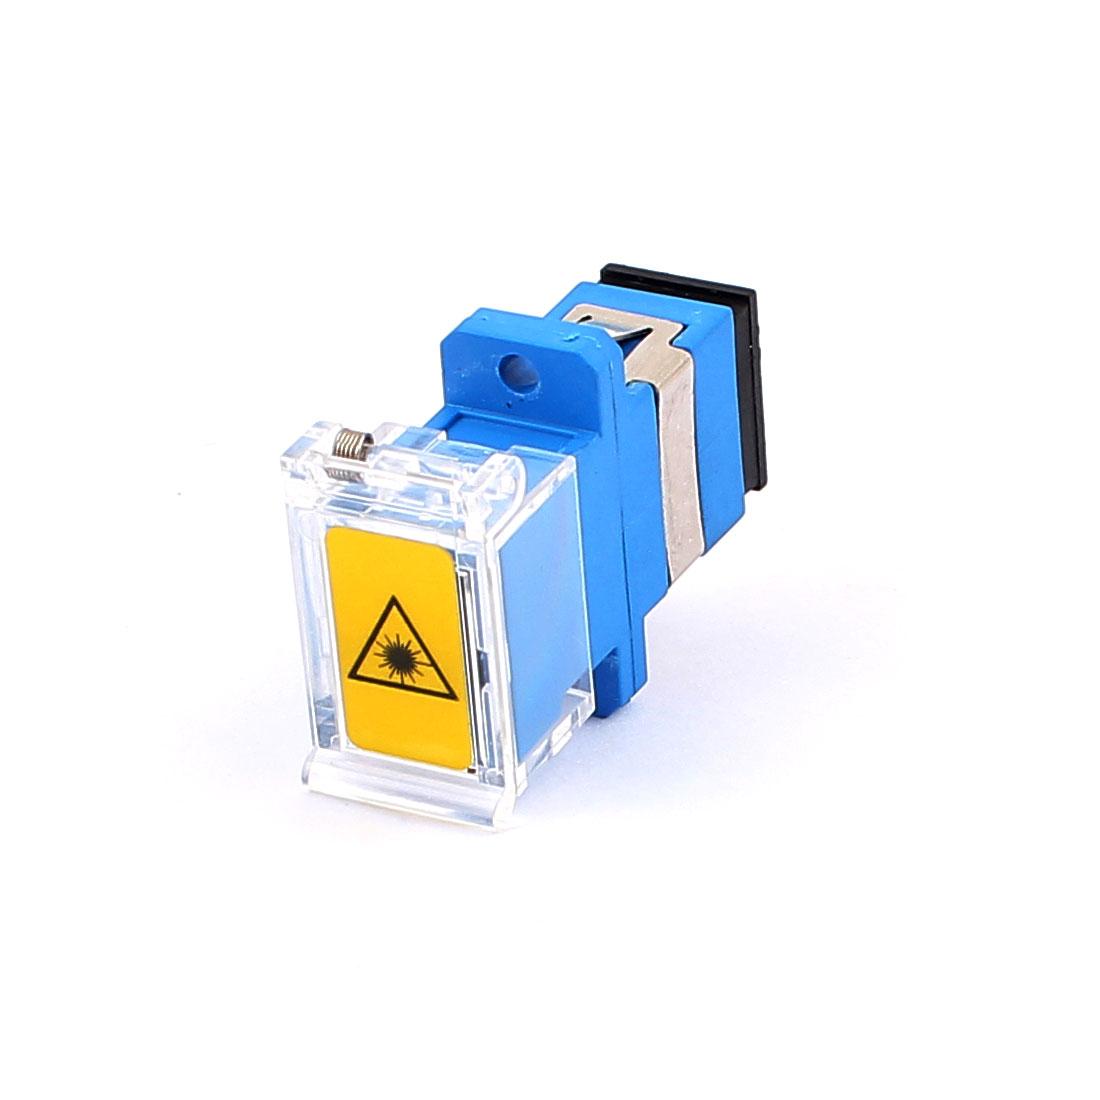 SM SC/APC Simplex Fibre Coupling Flange Optical Fiber Adapter w Anti-dust Cap Blue